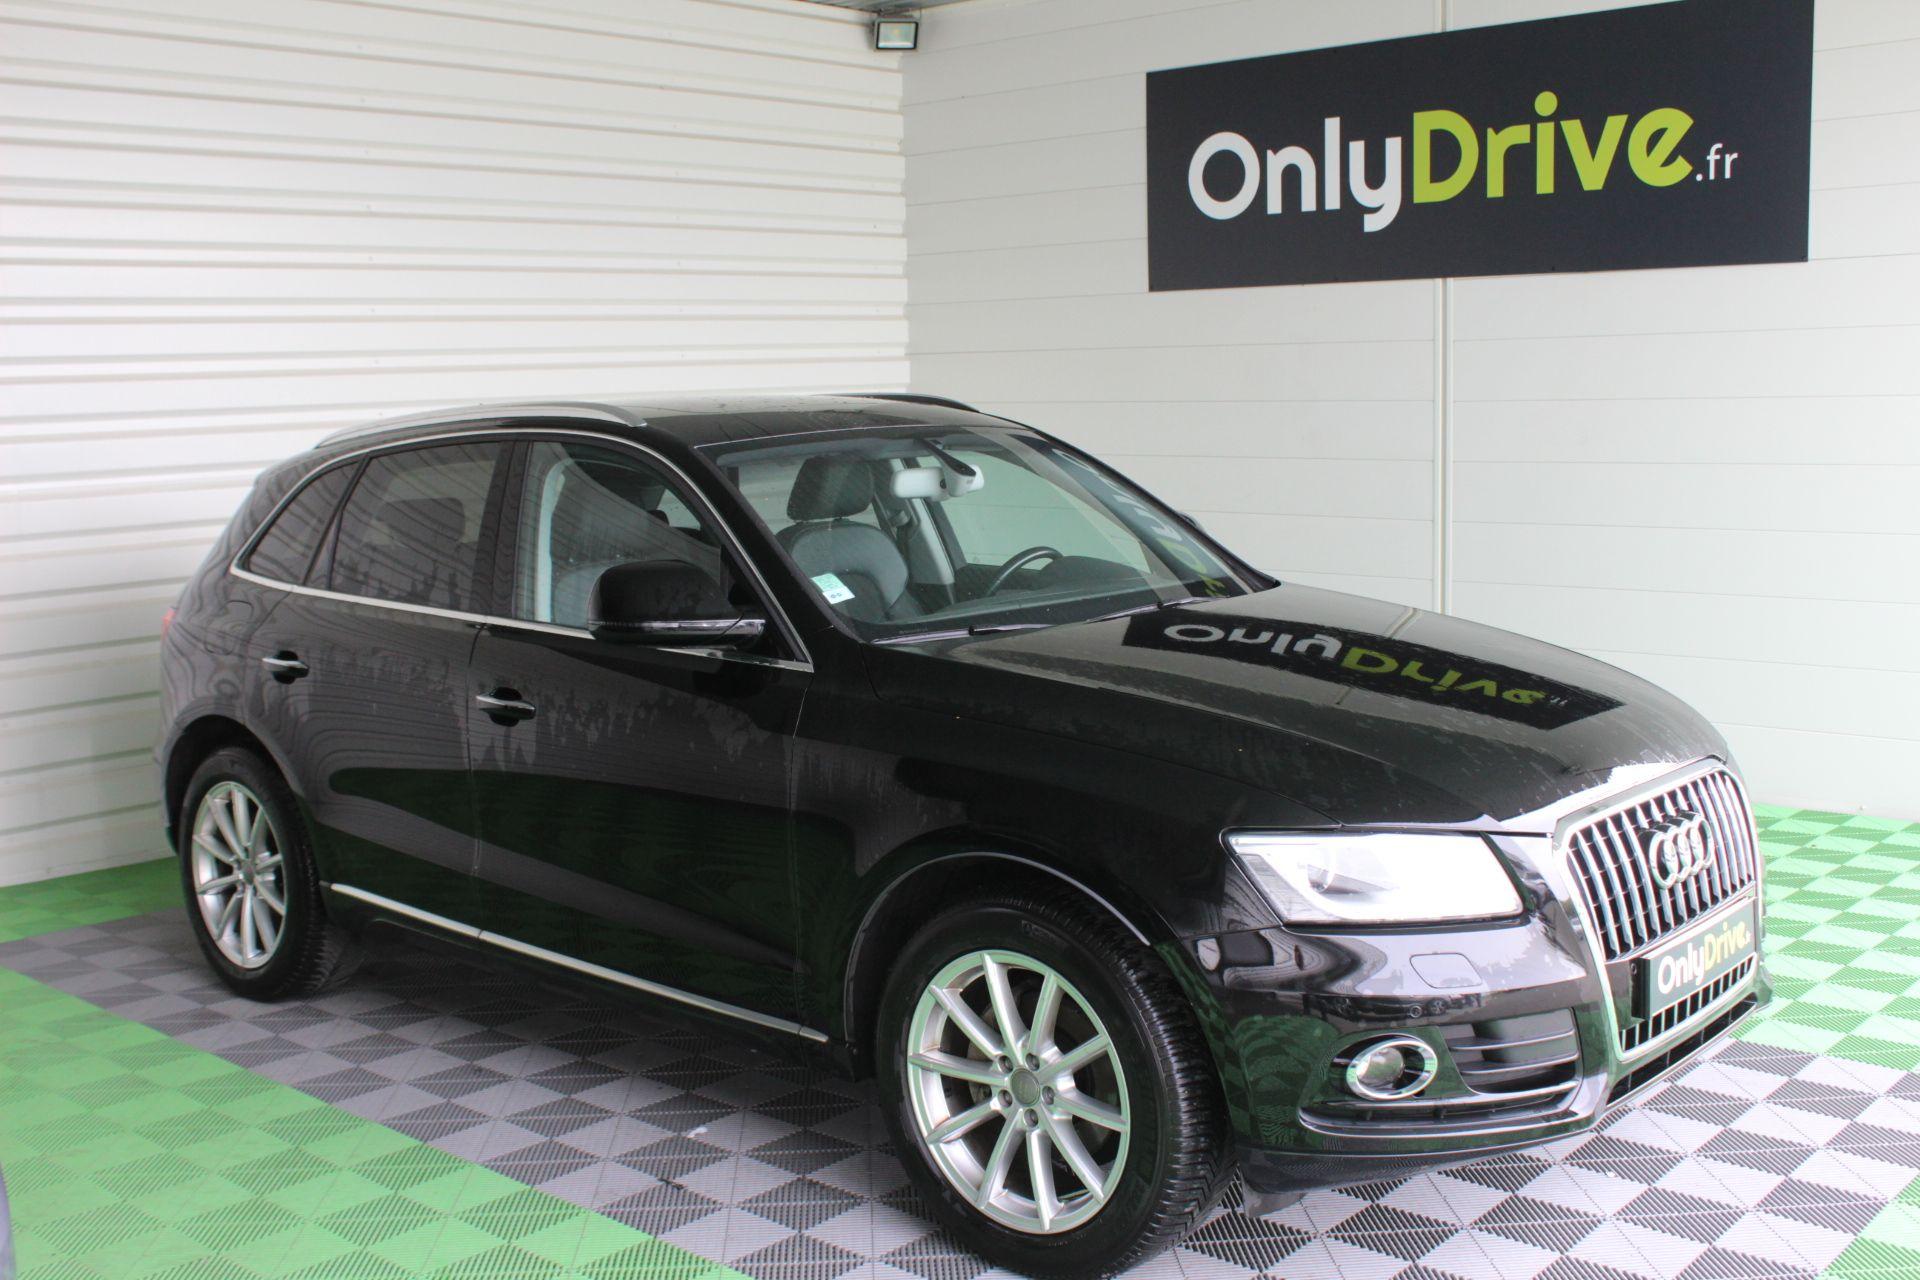 Audi Q5 2 0 Tdi 190 Avus S Tronic Suv Diesel Noir 2016 Garage